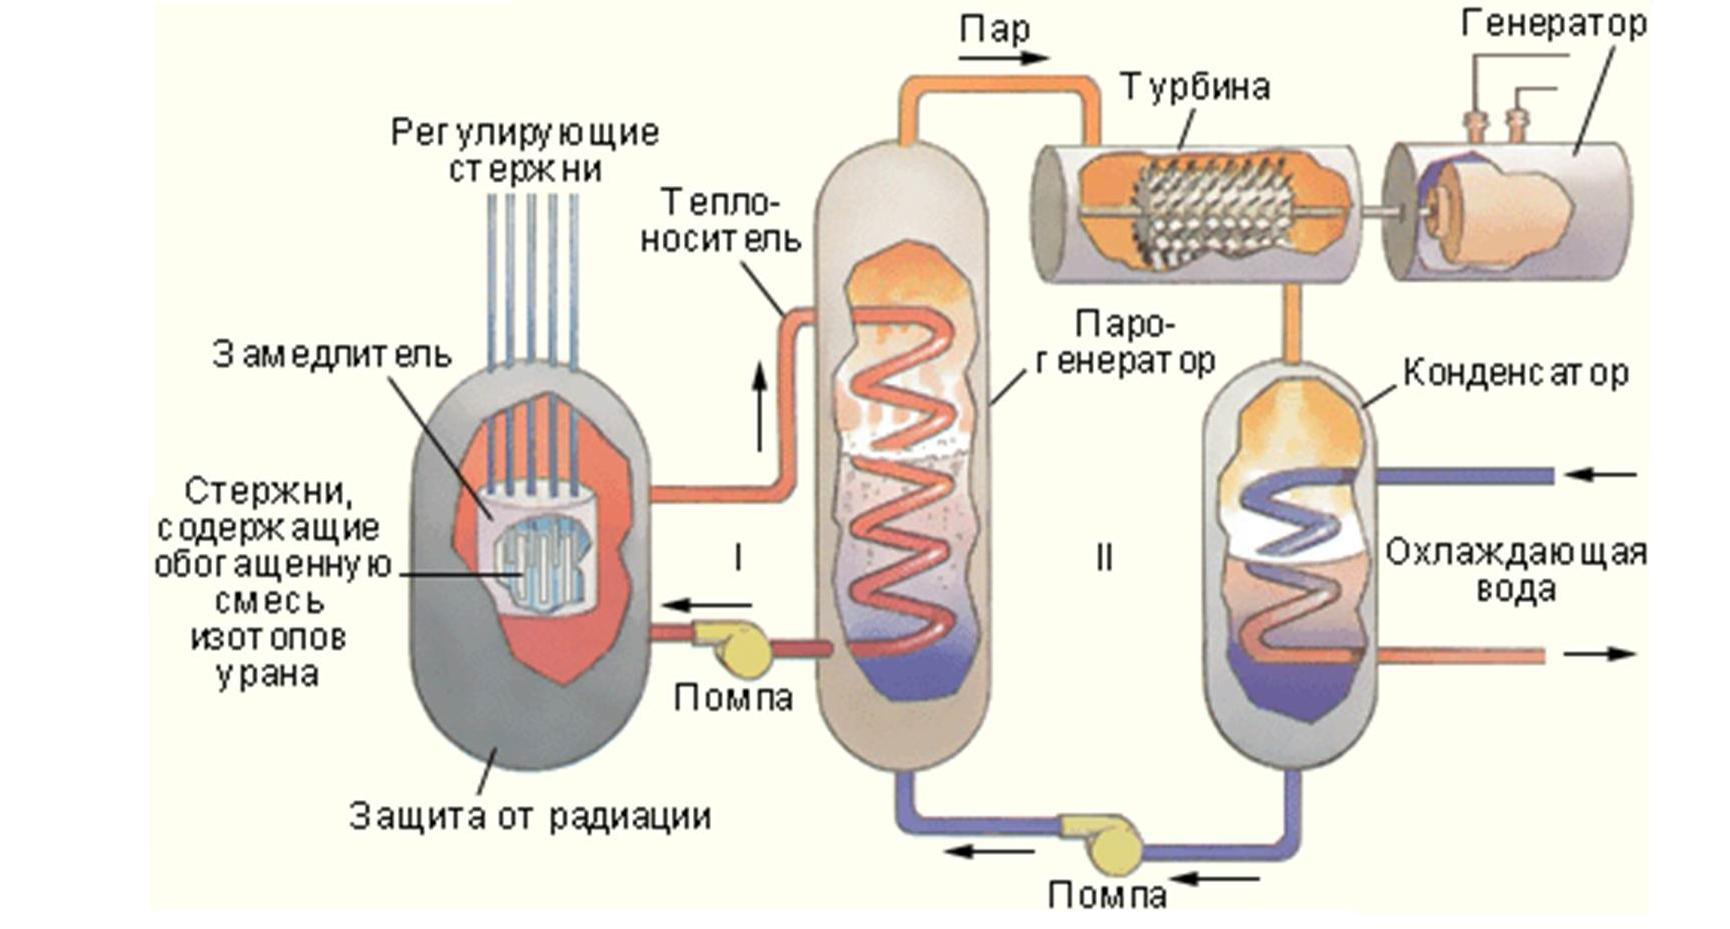 Схема атомного реактора на аэс